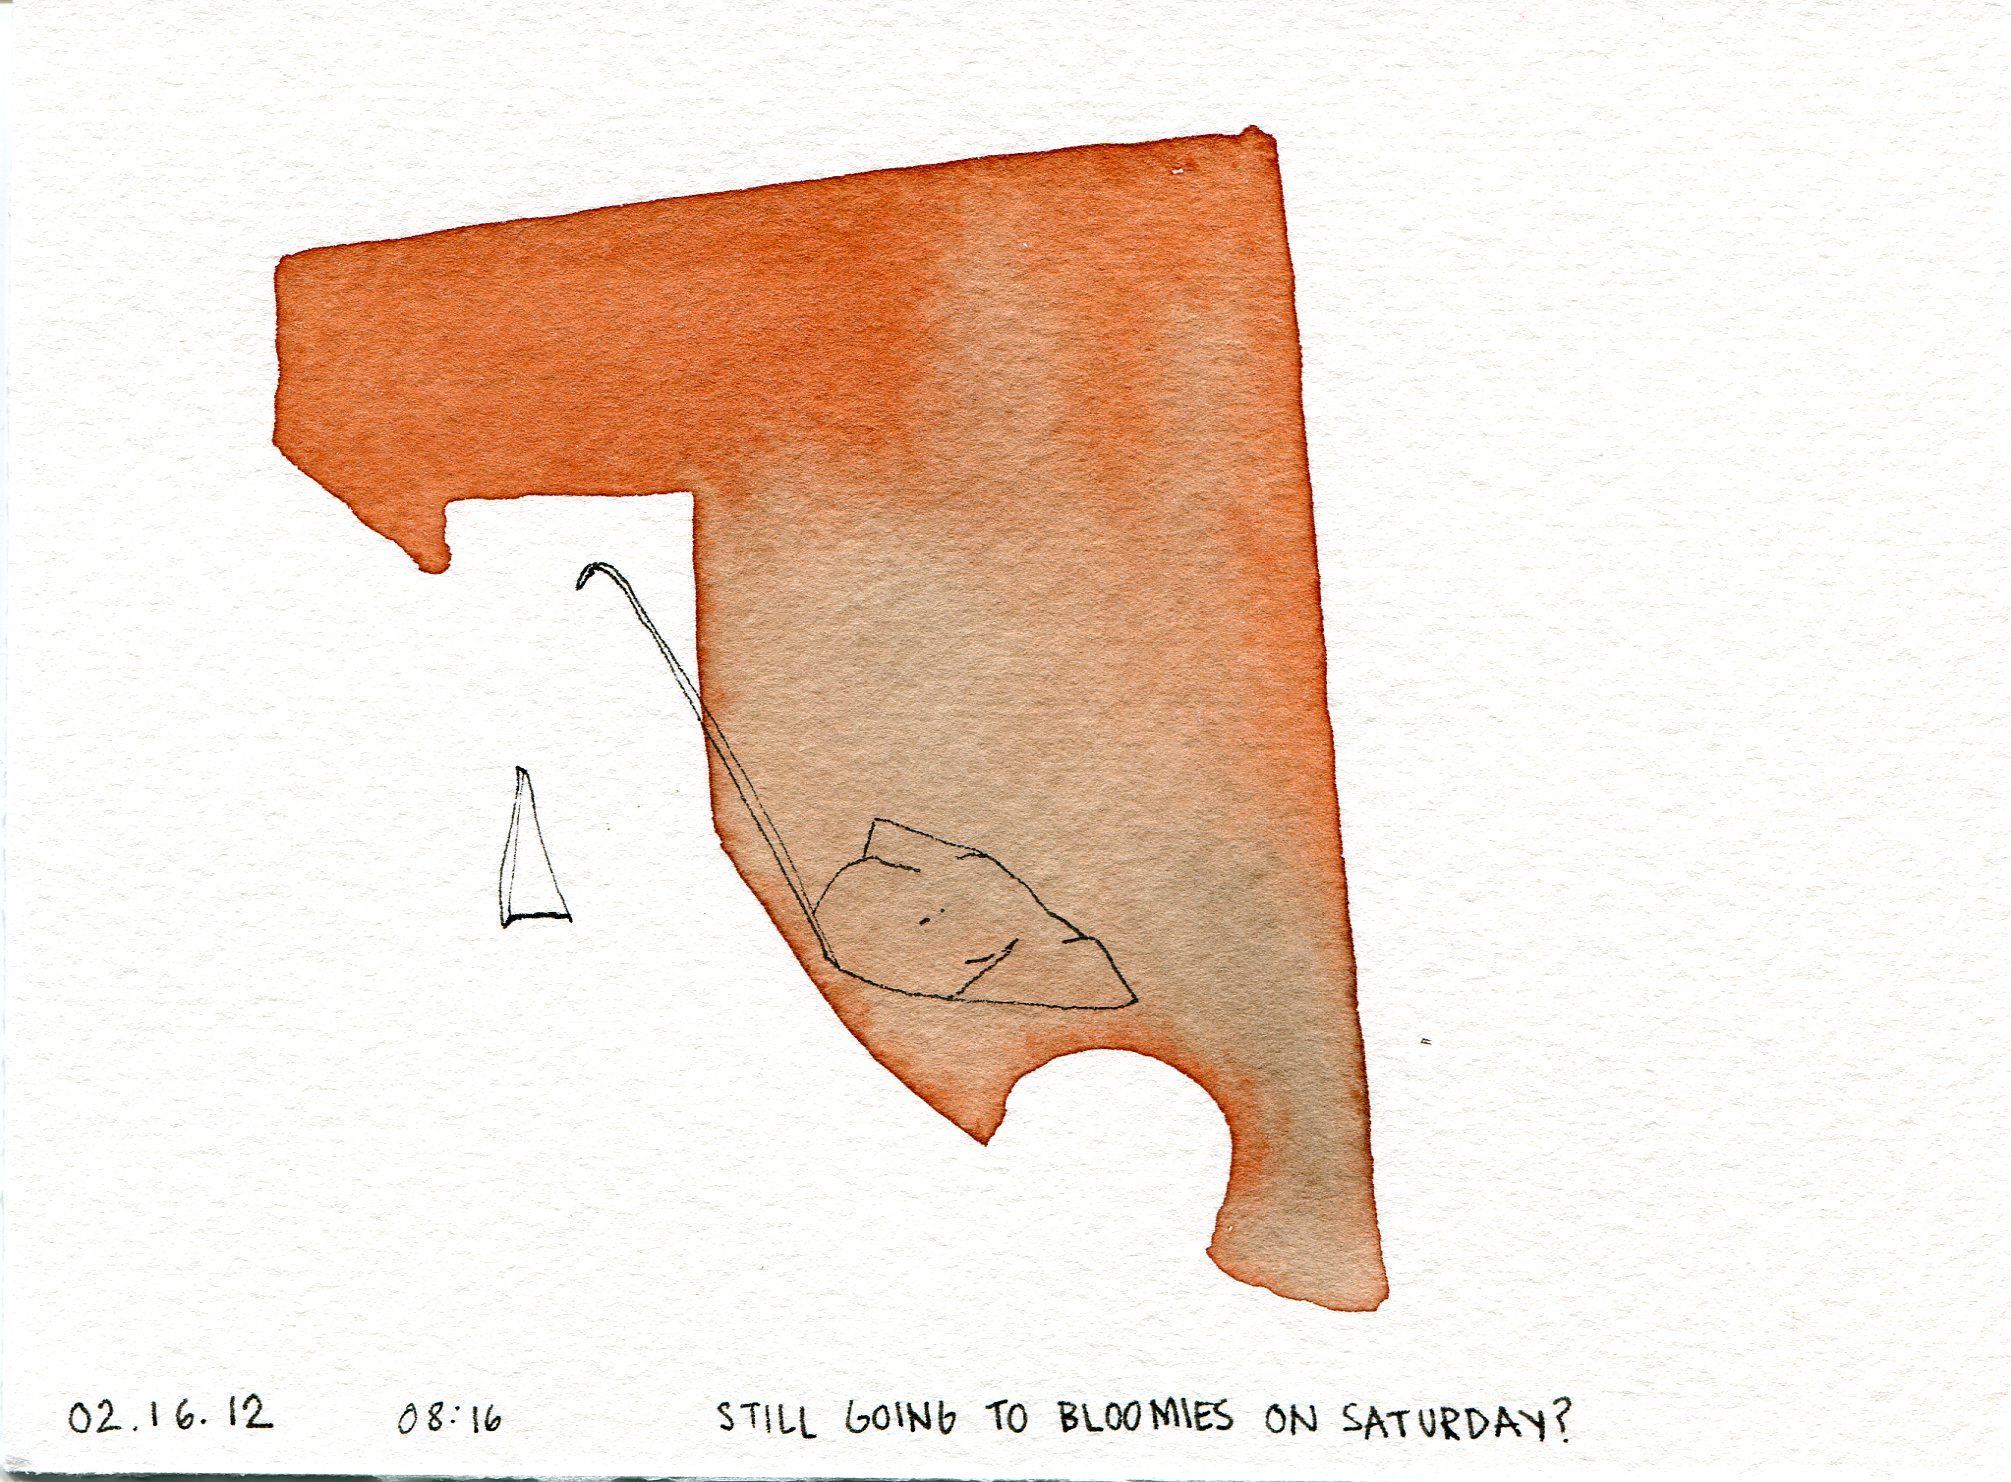 2012-02-17 drawing007.jpg